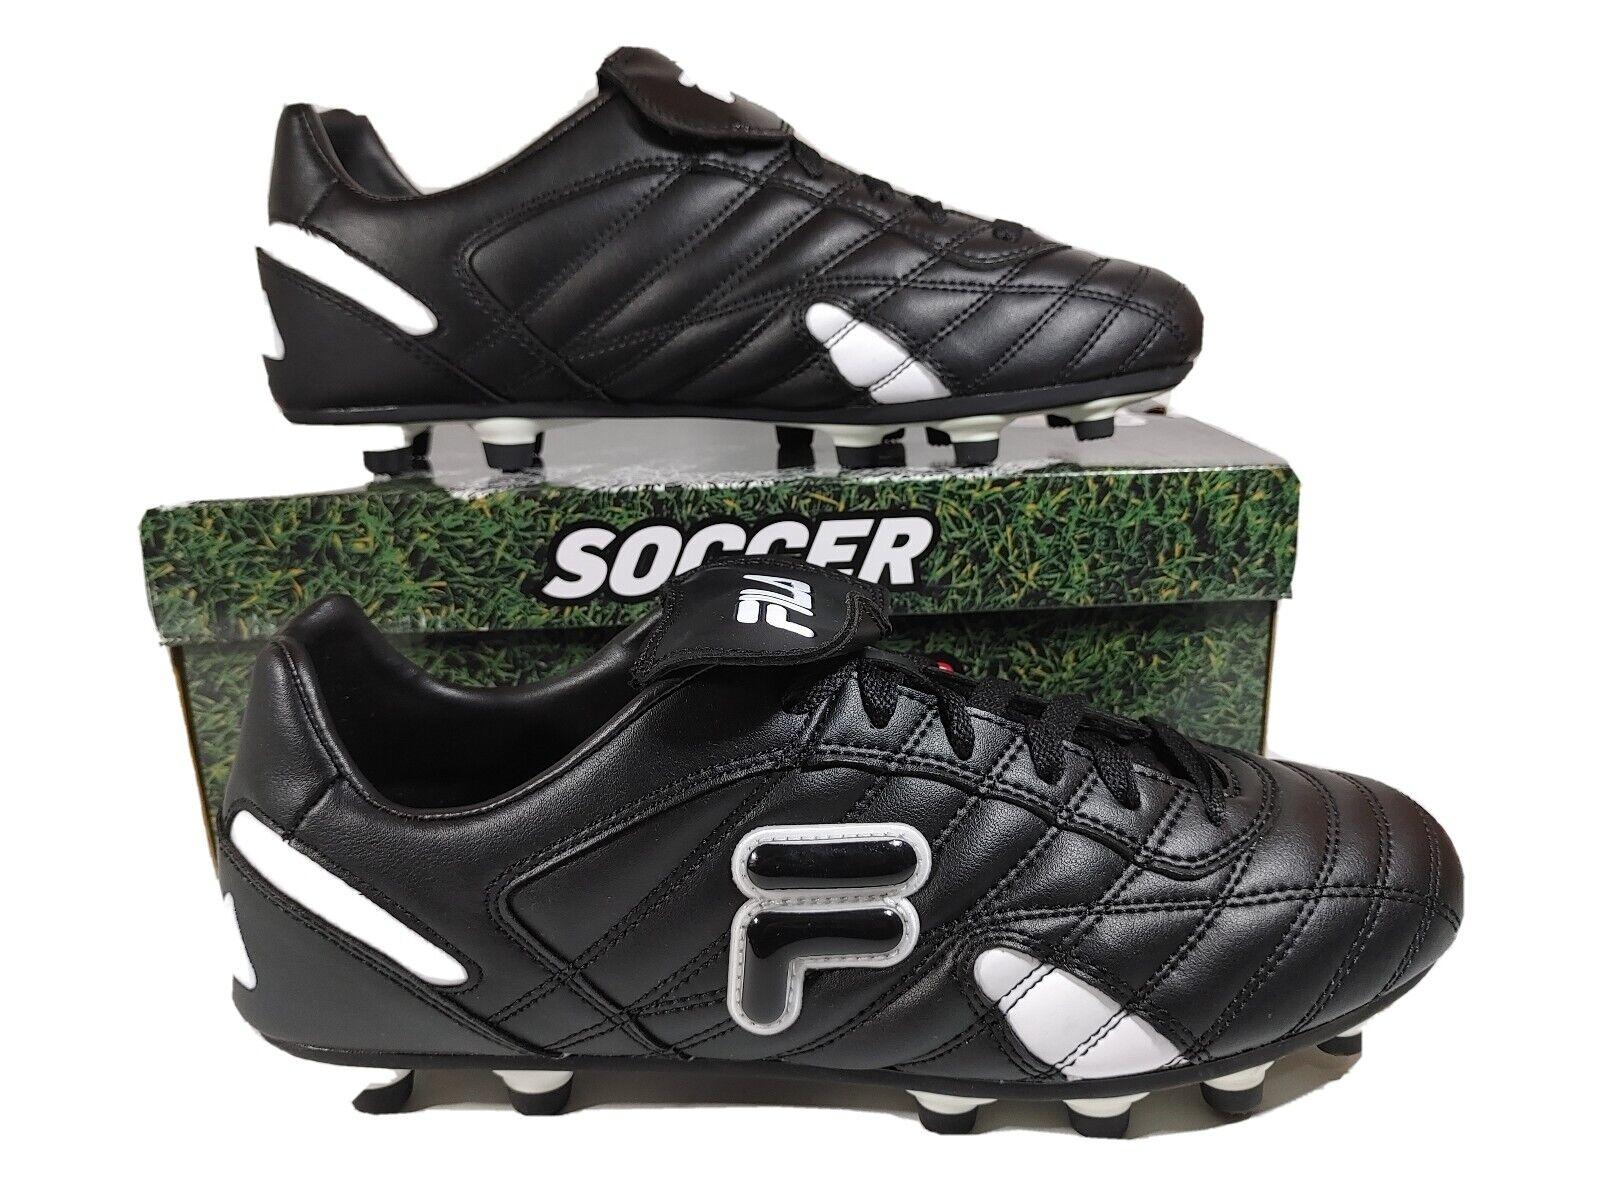 FILA Forza III RB Mens Outdoor Soccer